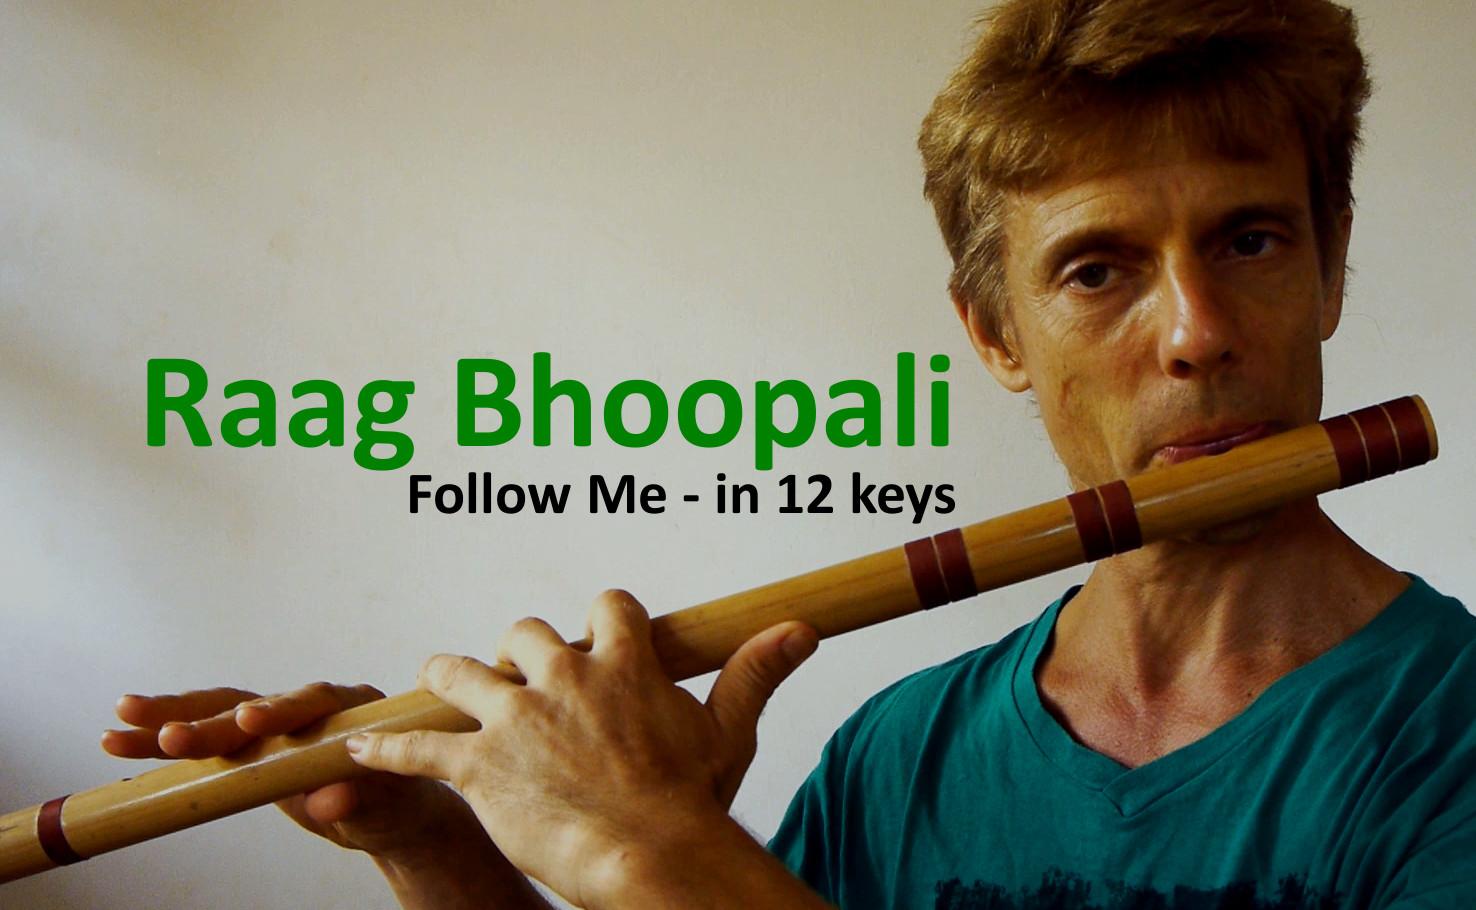 Raag Bhoopali - Follow Me in 12 keys - 300-185